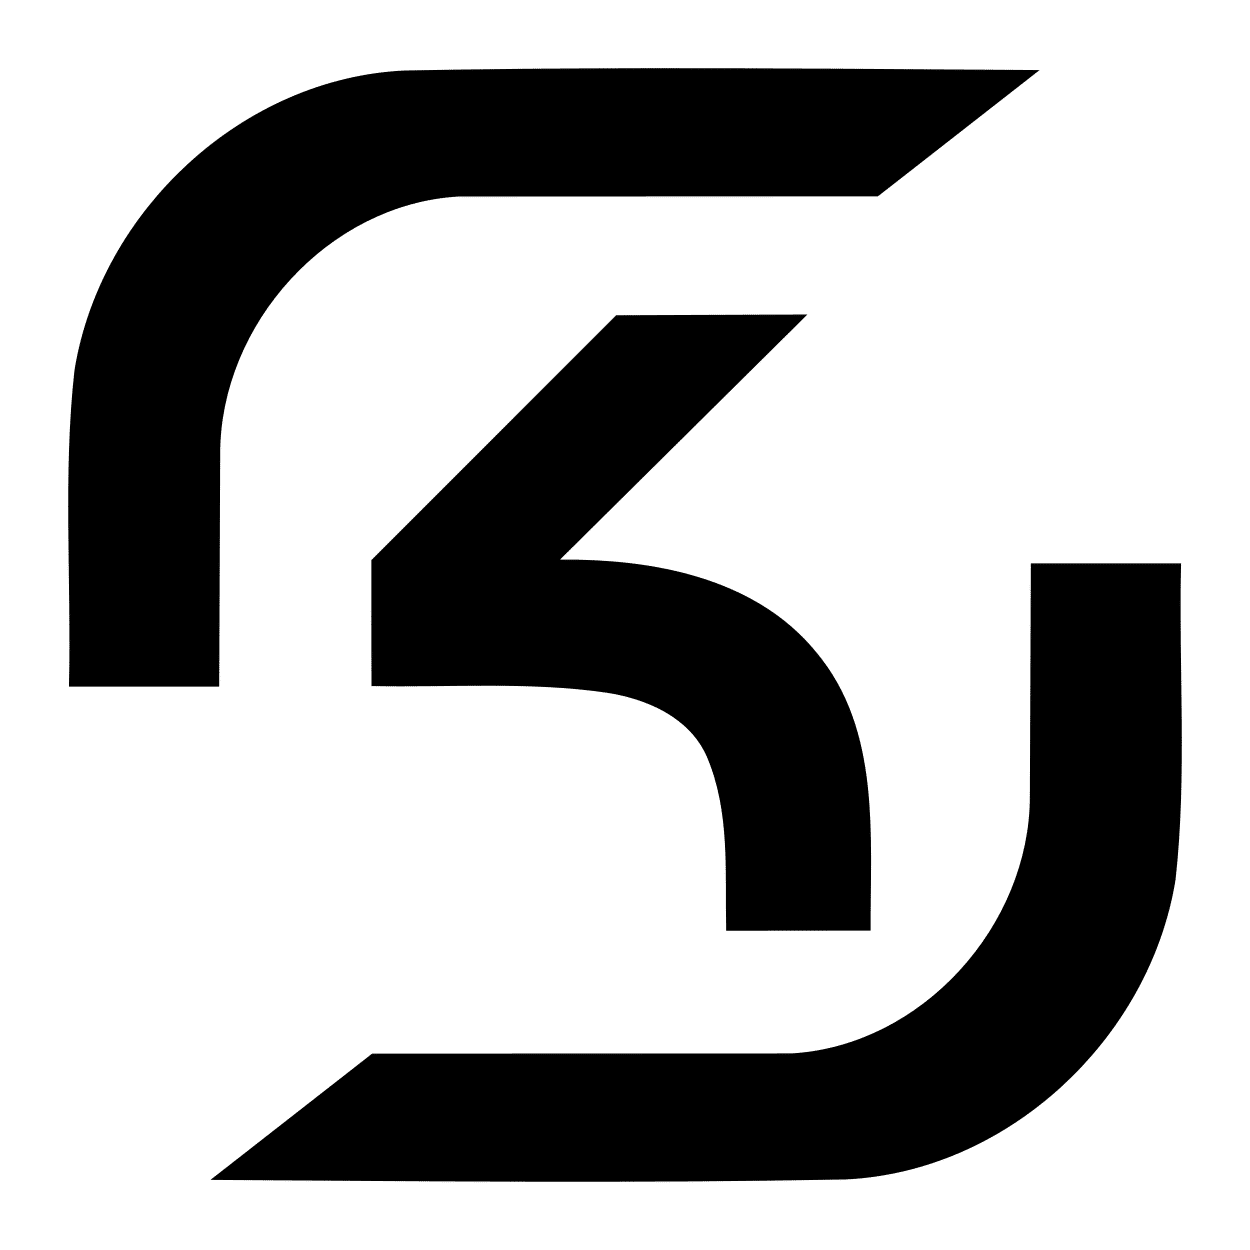 League of Legends - SK Gaming Logo